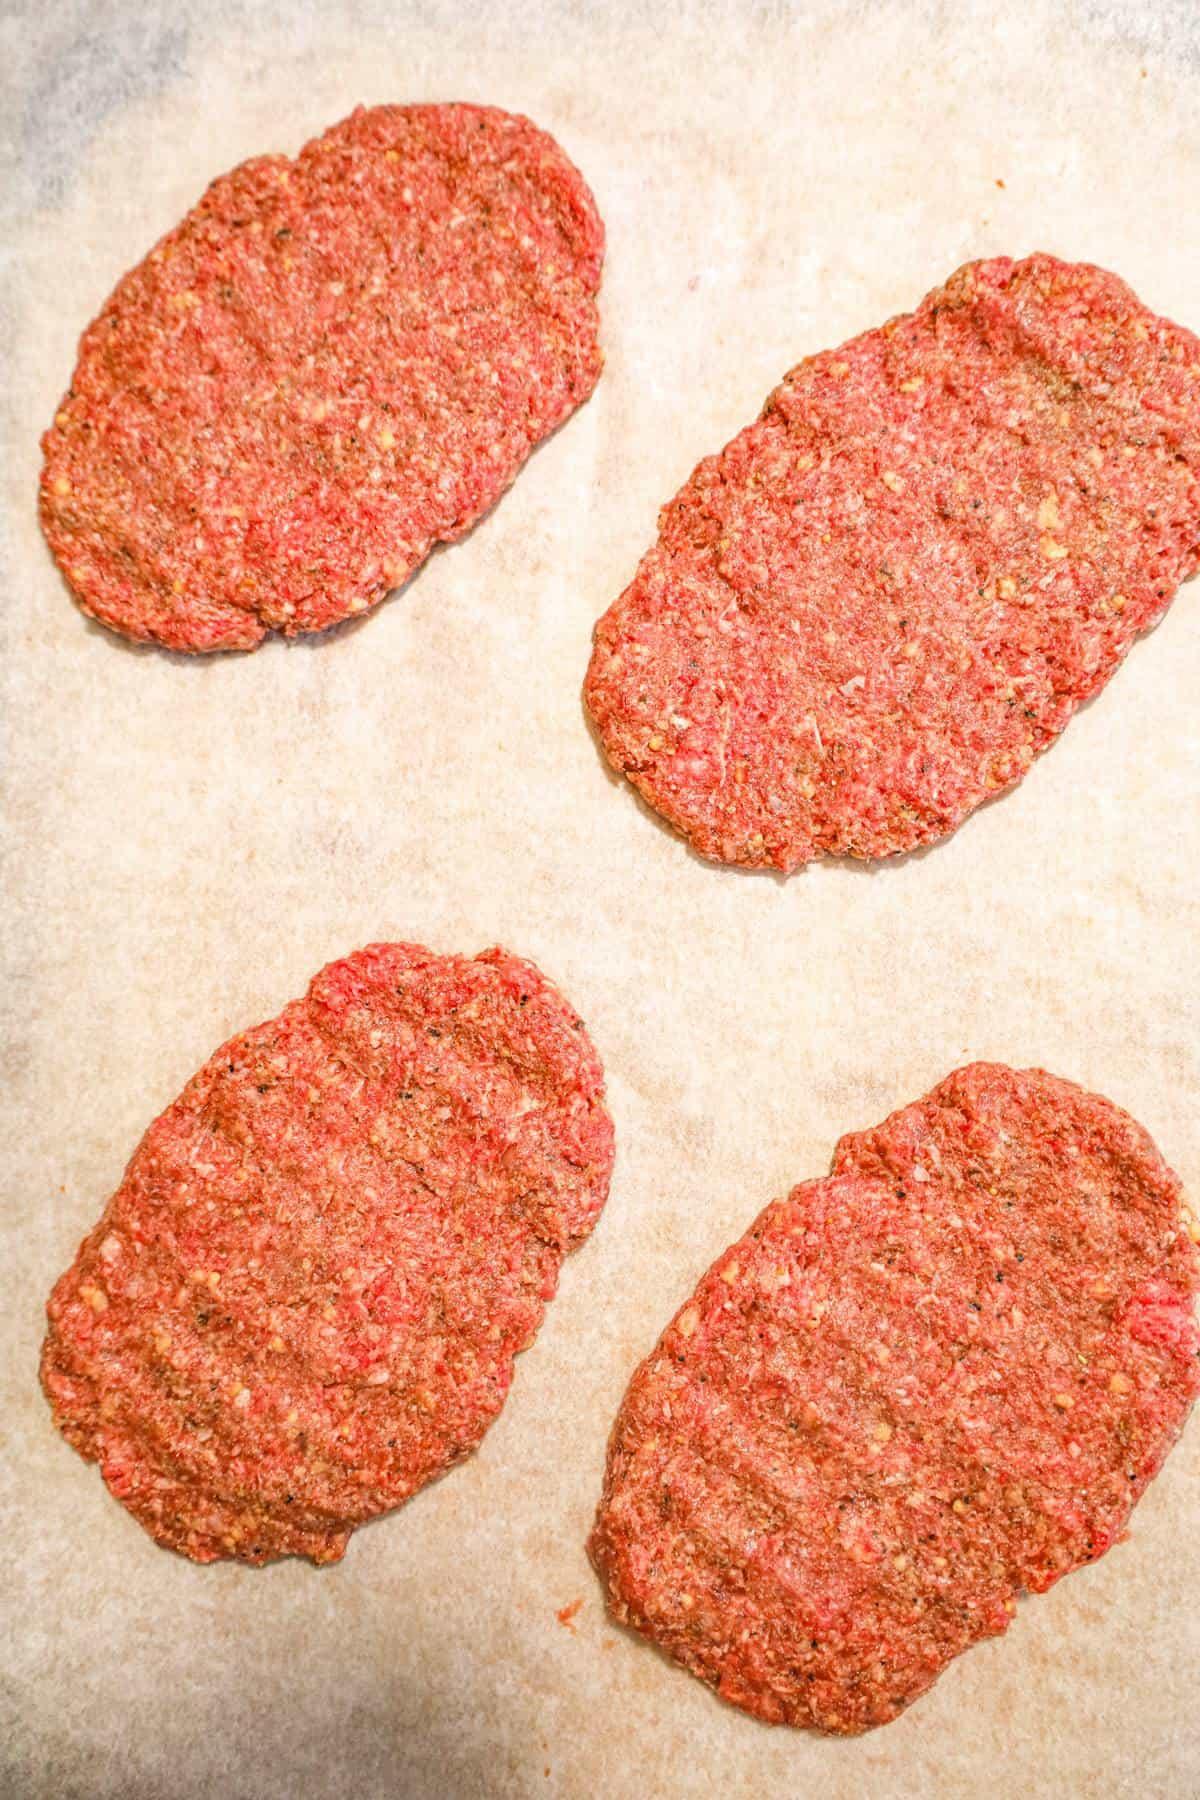 raw hamburger patties on parchment paper